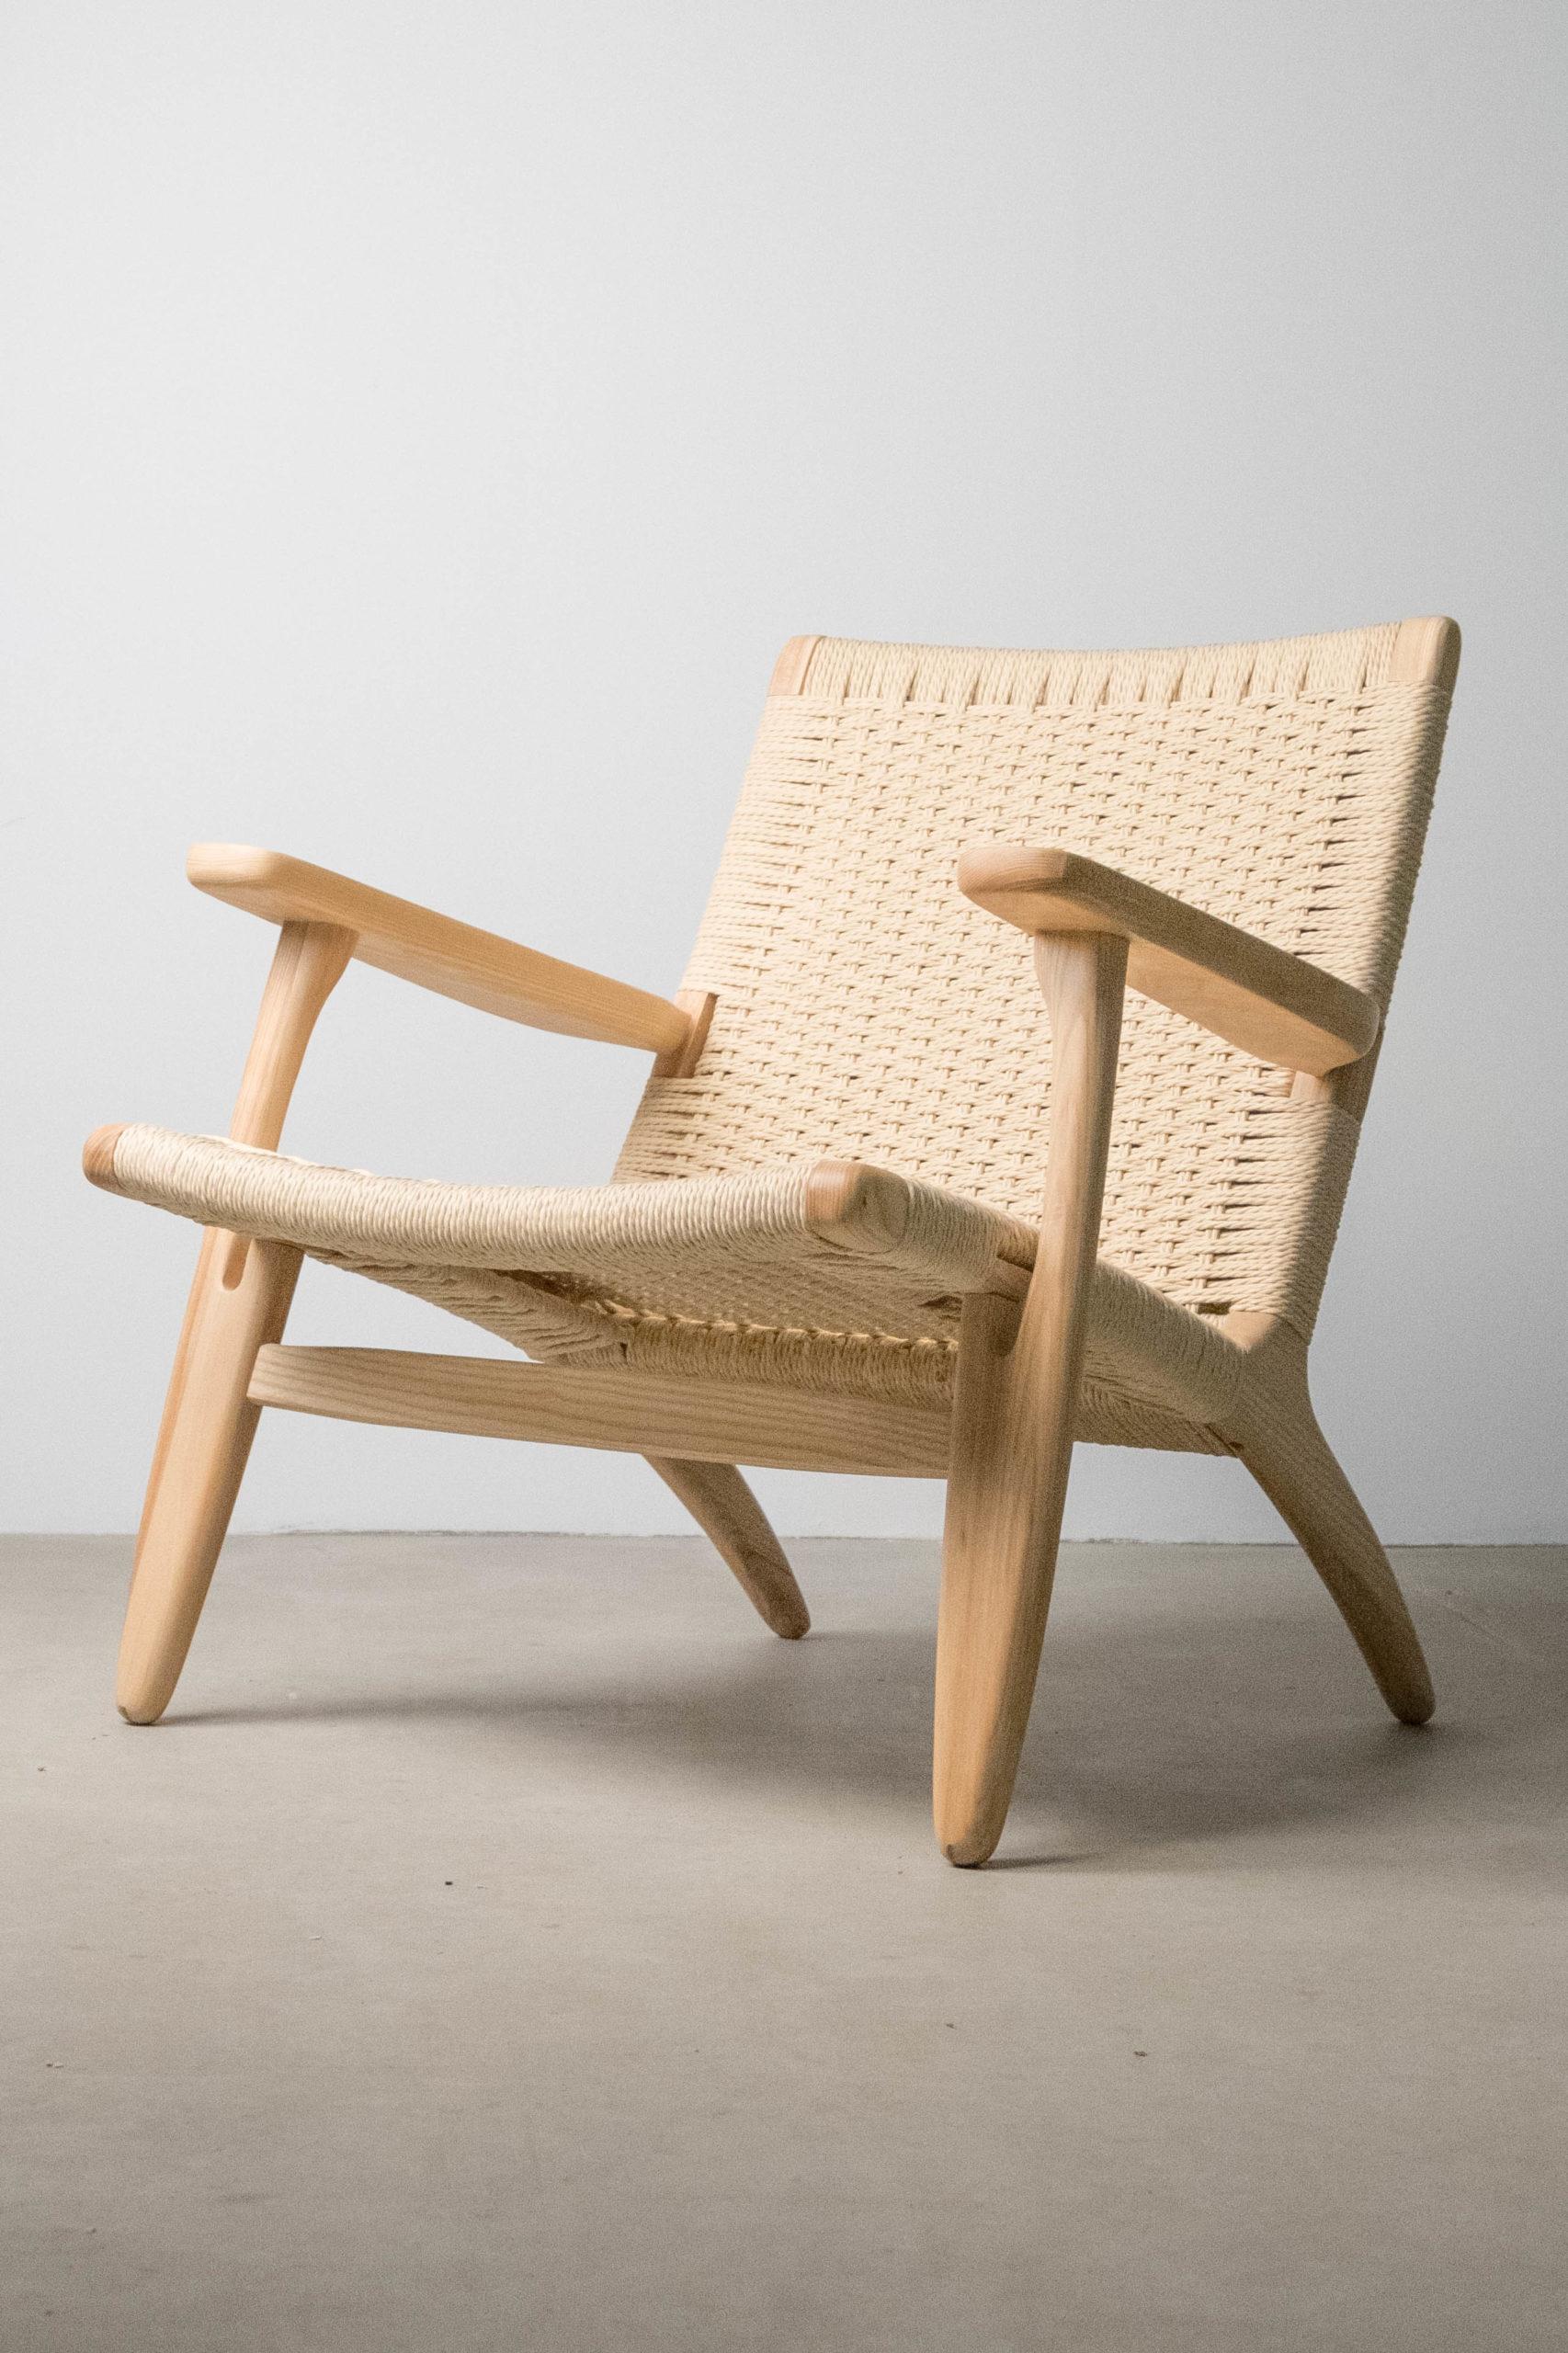 butaca hc25 de diseño madera roble de calidad salon